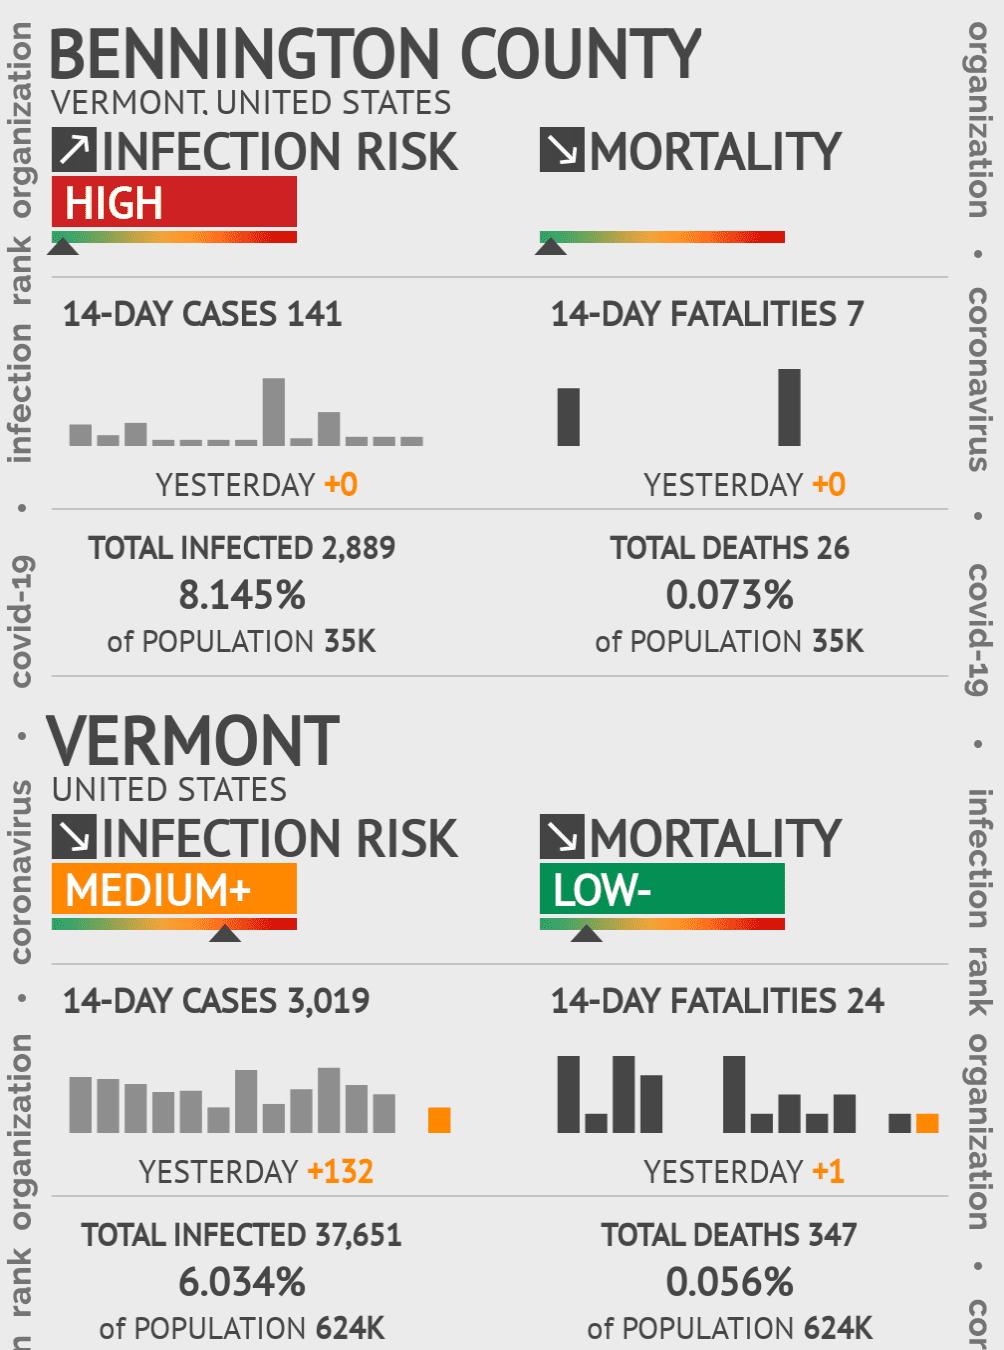 Bennington County Coronavirus Covid-19 Risk of Infection on July 24, 2021